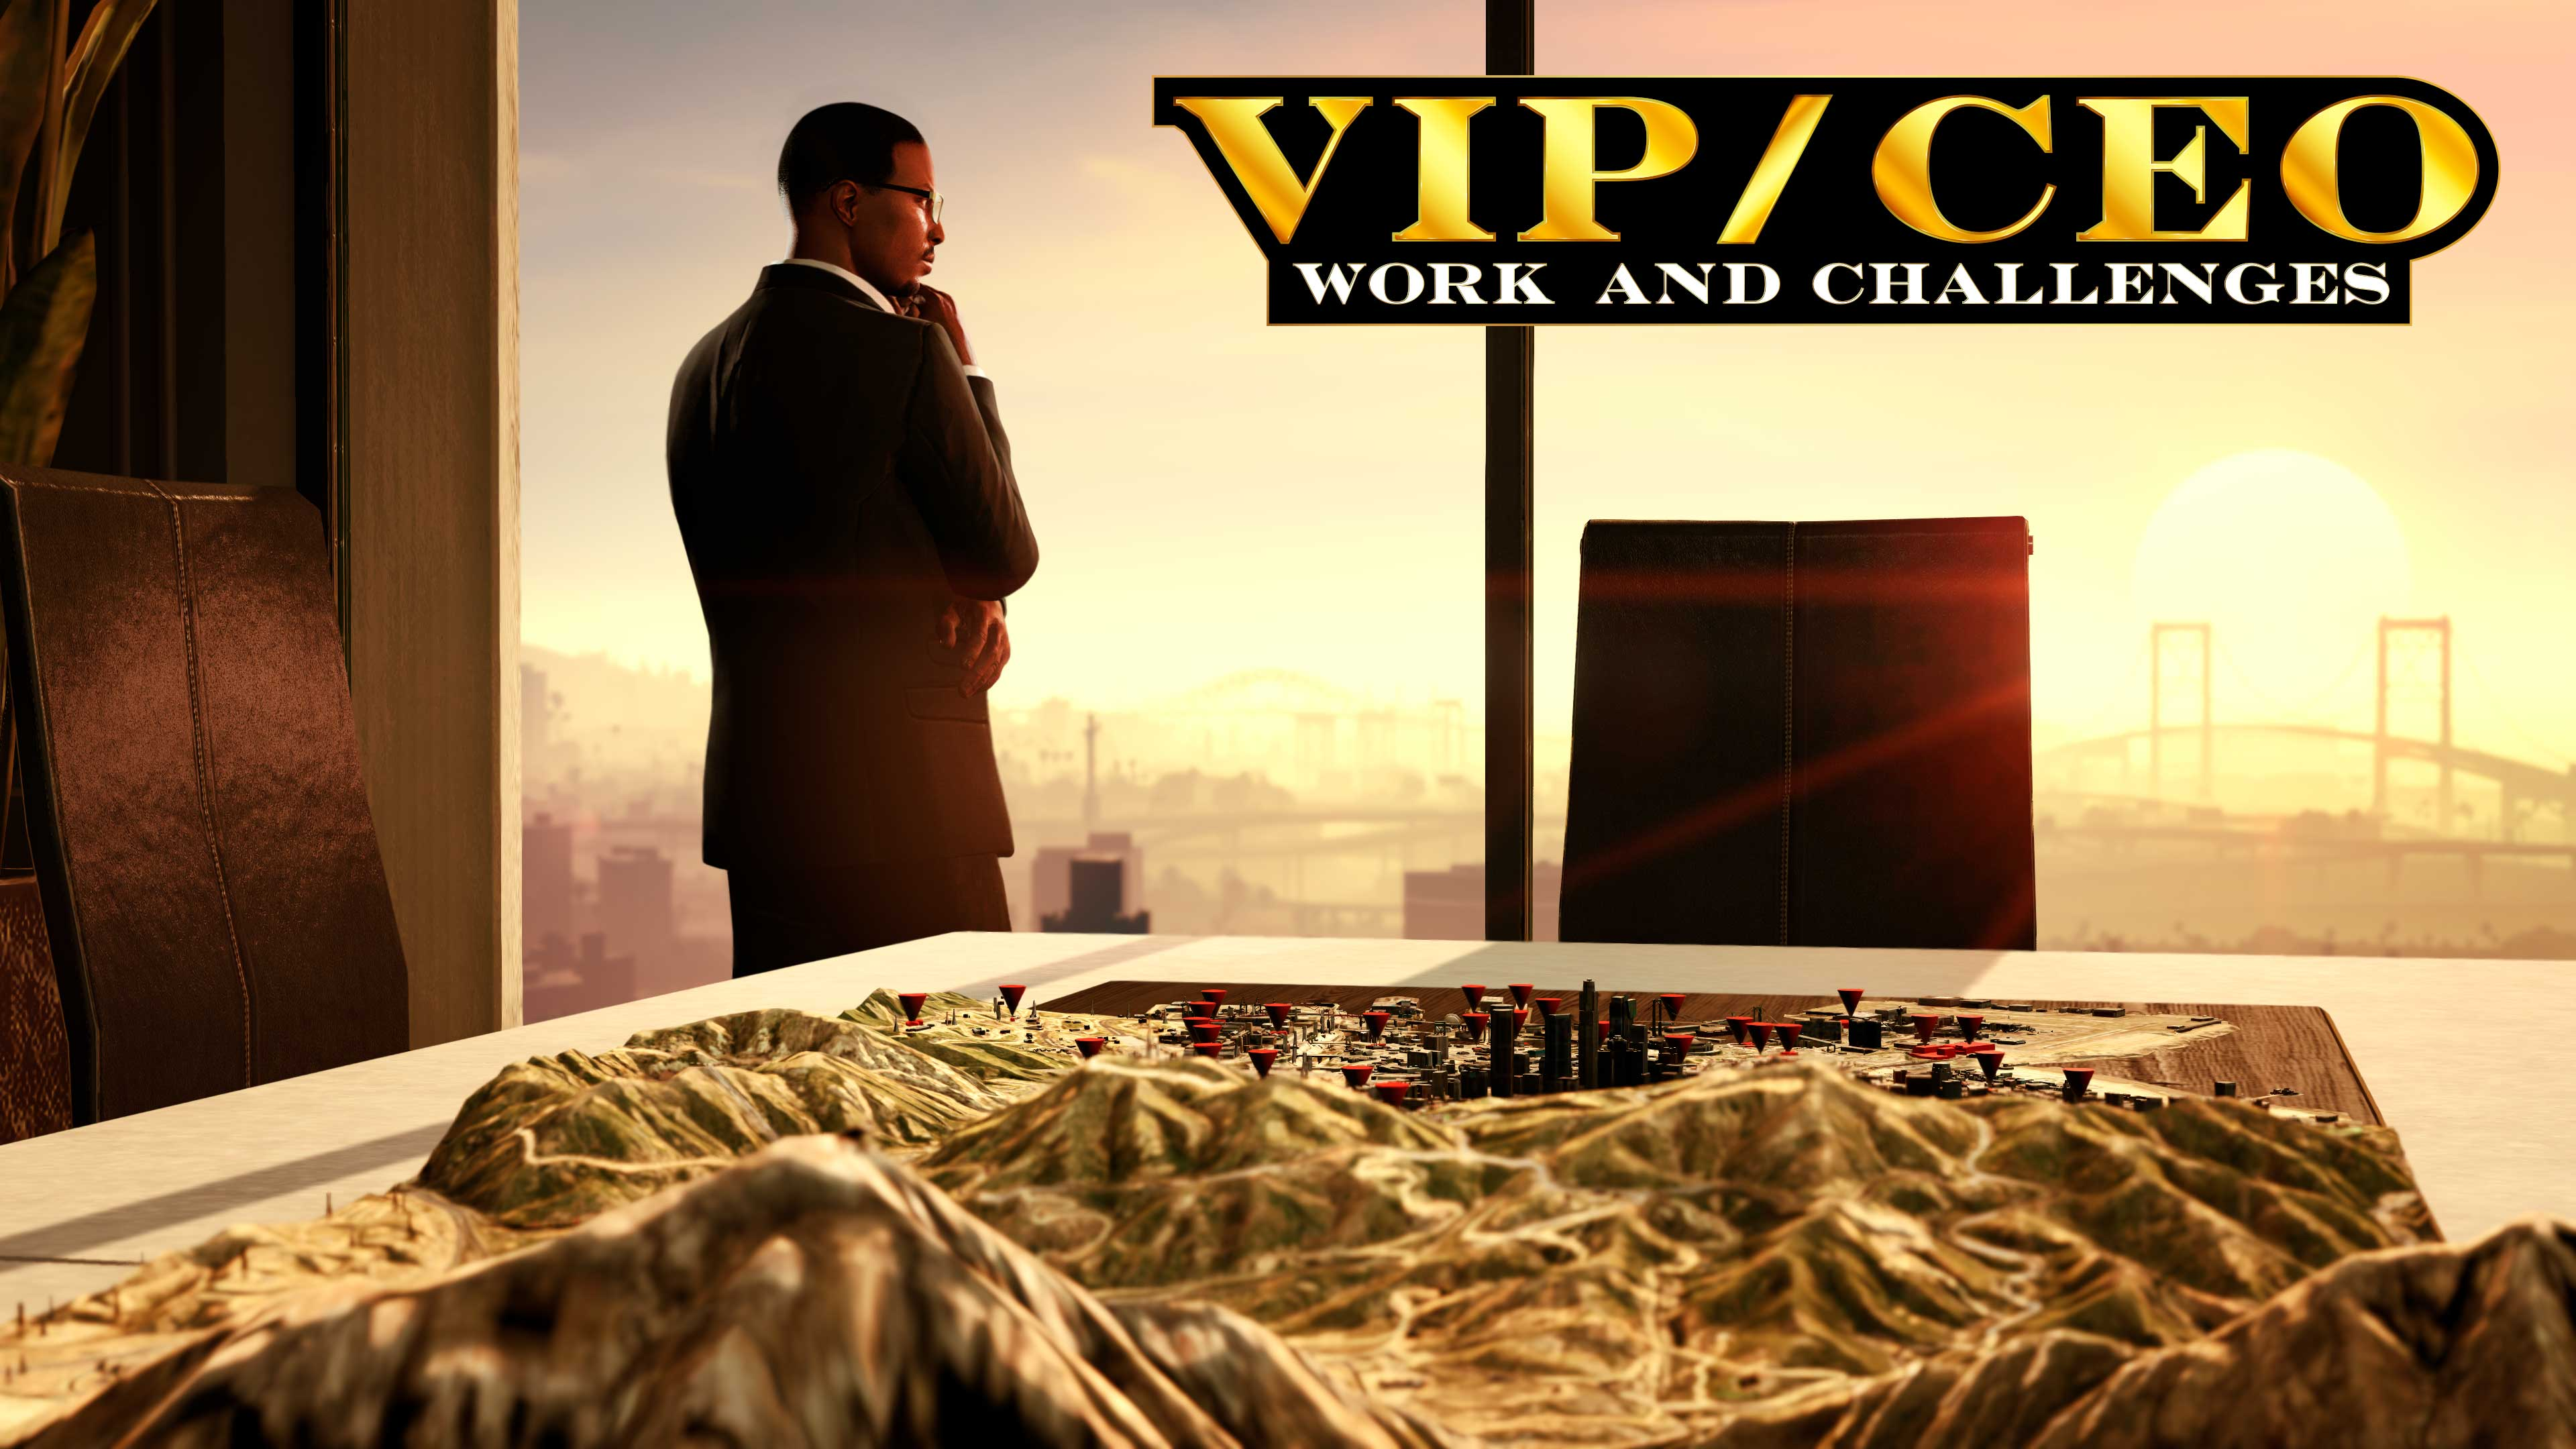 GTA Online CEO Work